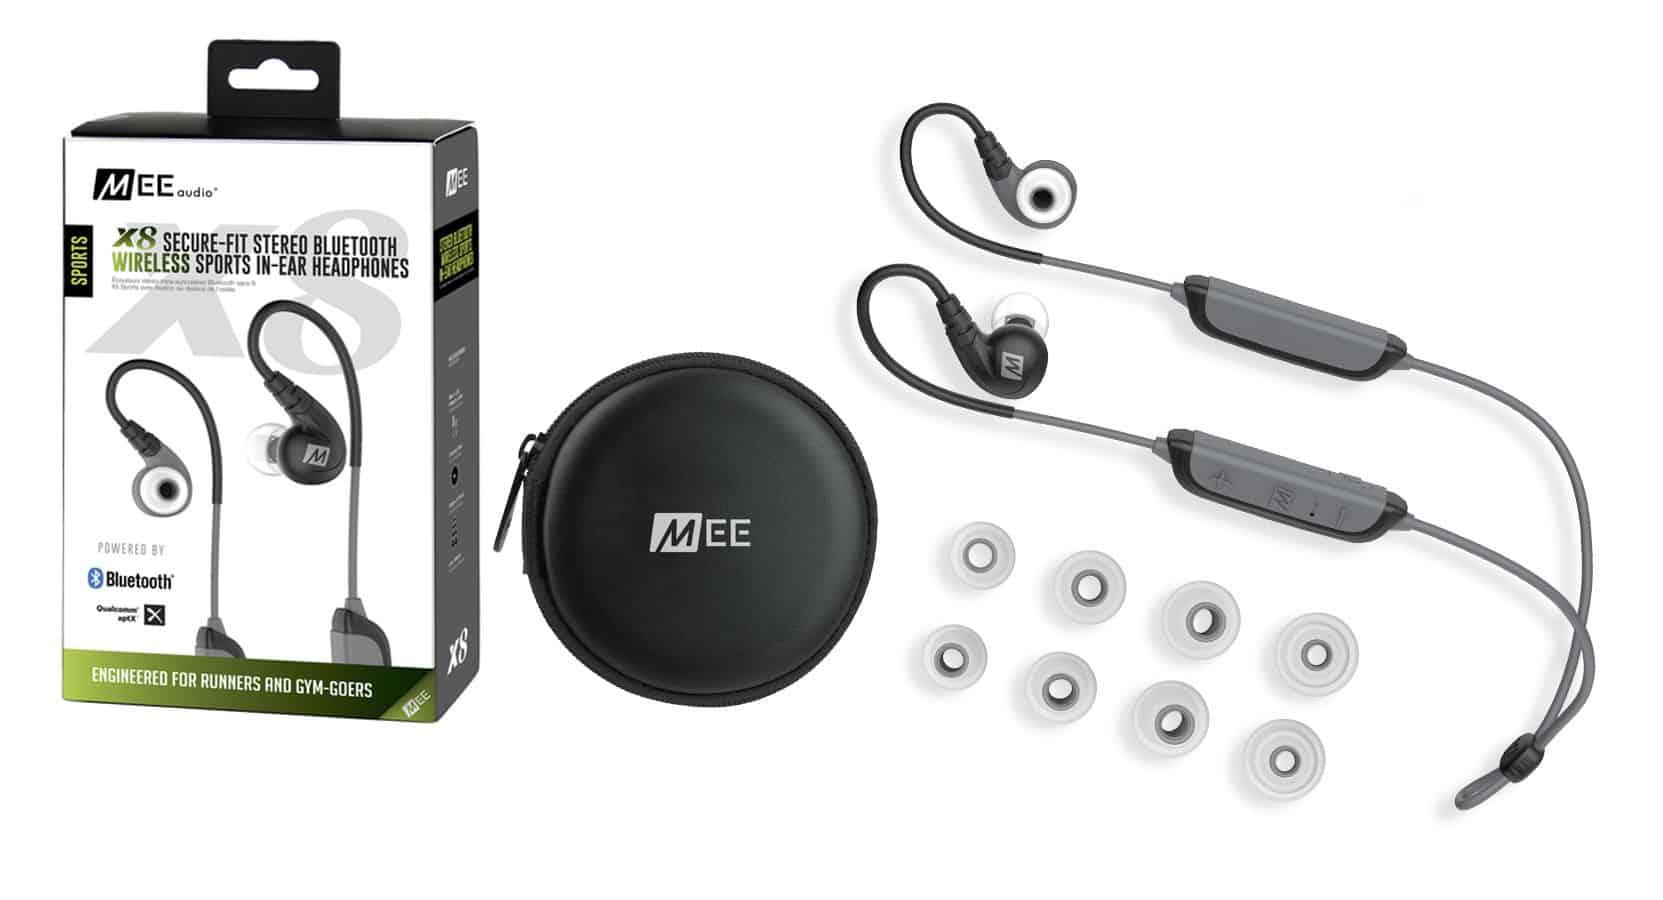 amazon MEE audio X8 reviews MEE audio X8 on amazon newest MEE audio X8 prices of MEE audio X8 MEE audio X8 deals best deals on MEE audio X8 buying a MEE audio X8 lastest MEE audio X8 what is a MEE audio X8 MEE audio X8 at amazon where to buy MEE audio X8 where can i you get a MEE audio X8 online purchase MEE audio X8 MEE audio X8 sale off MEE audio X8 discount cheapest MEE audio X8 MEE audio X8 for sale MEE audio X8 products MEE audio X8 tutorial MEE audio X8 specification MEE audio X8 features MEE audio X8 test MEE audio X8 series MEE audio X8 service manual MEE audio X8 instructions MEE audio X8 accessories mee audio x8-bk review mee audio x8 wireless review mee audio x8 review mee audio x8 wireless sports earphone mee audio x8 singapore mee audio x8 securefit stereo bluetooth tai nghe mee audio x8 mee audio x8 test mee audio x7 vs x8 mee audio x6 vs x7 vs x8 mee audio x8 vs jaybird x3 mee audio x8 và x7 plus mee audio x8 wireless mee audio x7 plus x8 mee audio x8-bk mee audio x8 plus mee audio x8 manual mee audio x8 bluetooth mee audio x8 black mee audio x8vs jaybird x3 mee audio x8và x7 plus mee audio x8 amazon mee audio ep-x8 mee audio x8 pairing mee audio x8 reddit mee audio x8 vs x7 plus